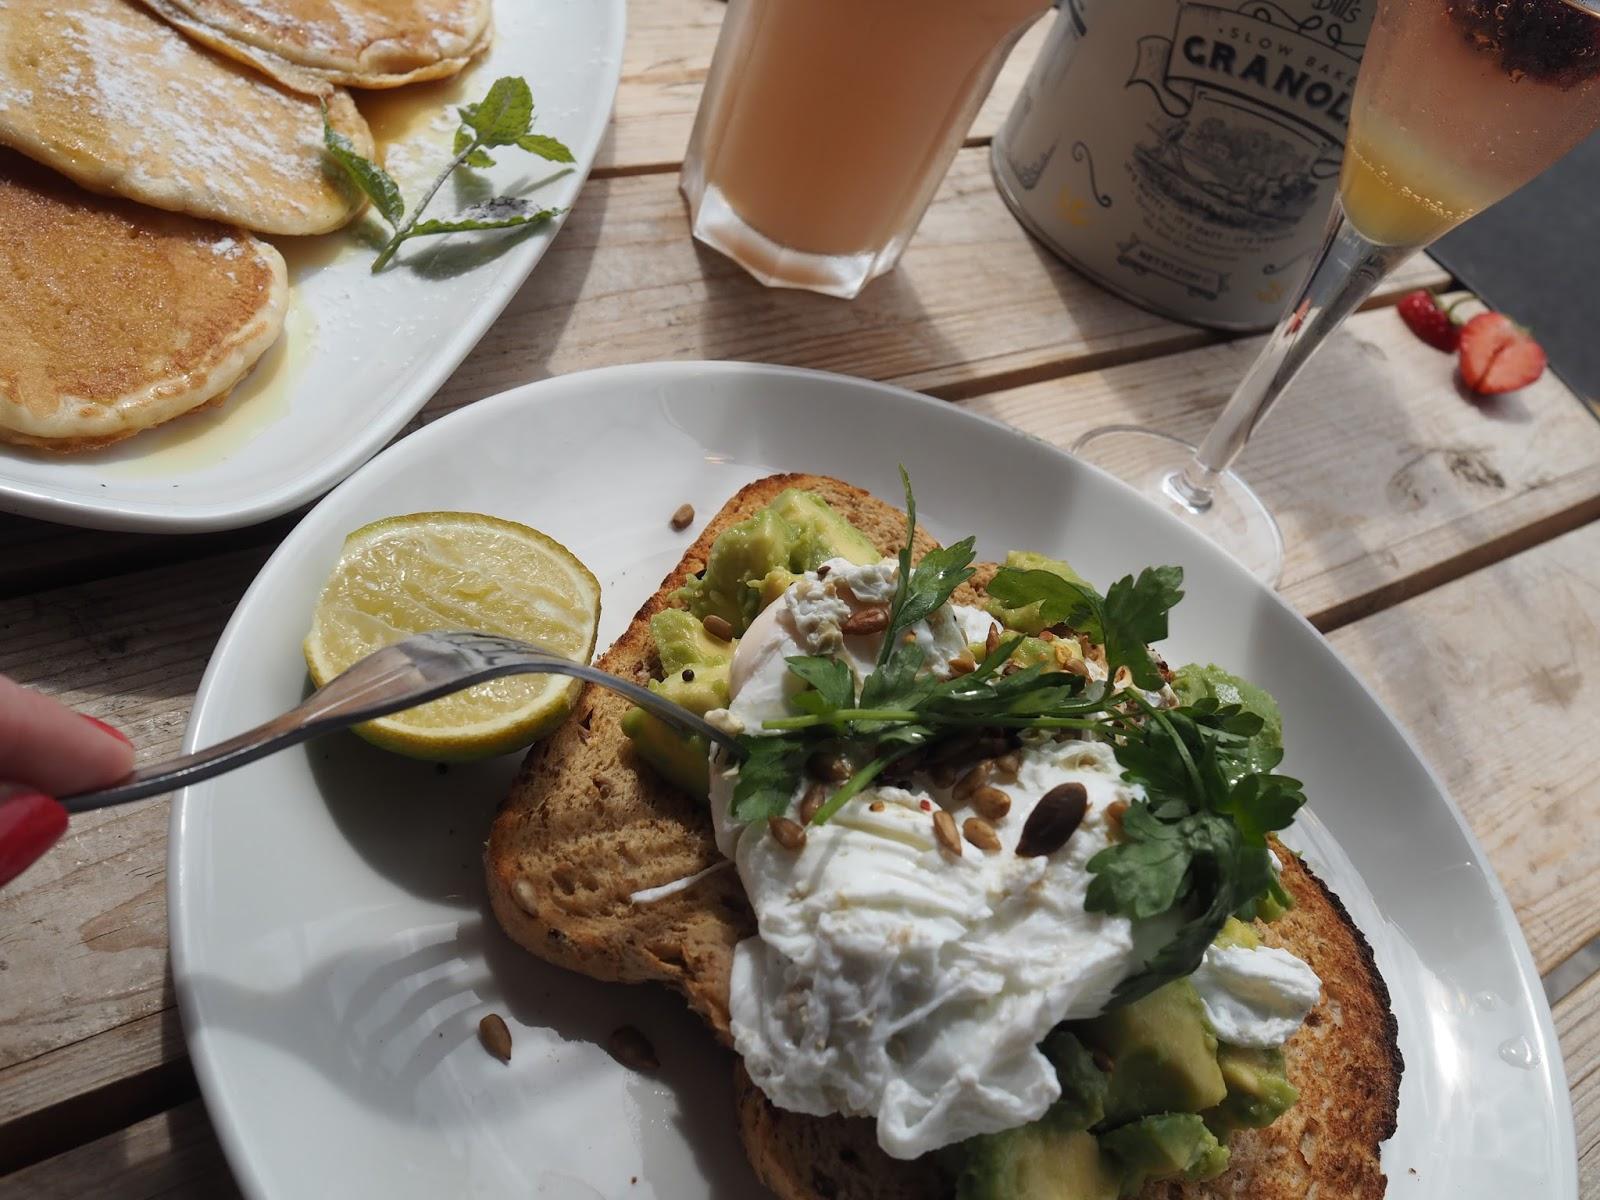 Avocado and poached egg on toast, Bills restaurant, Brighton